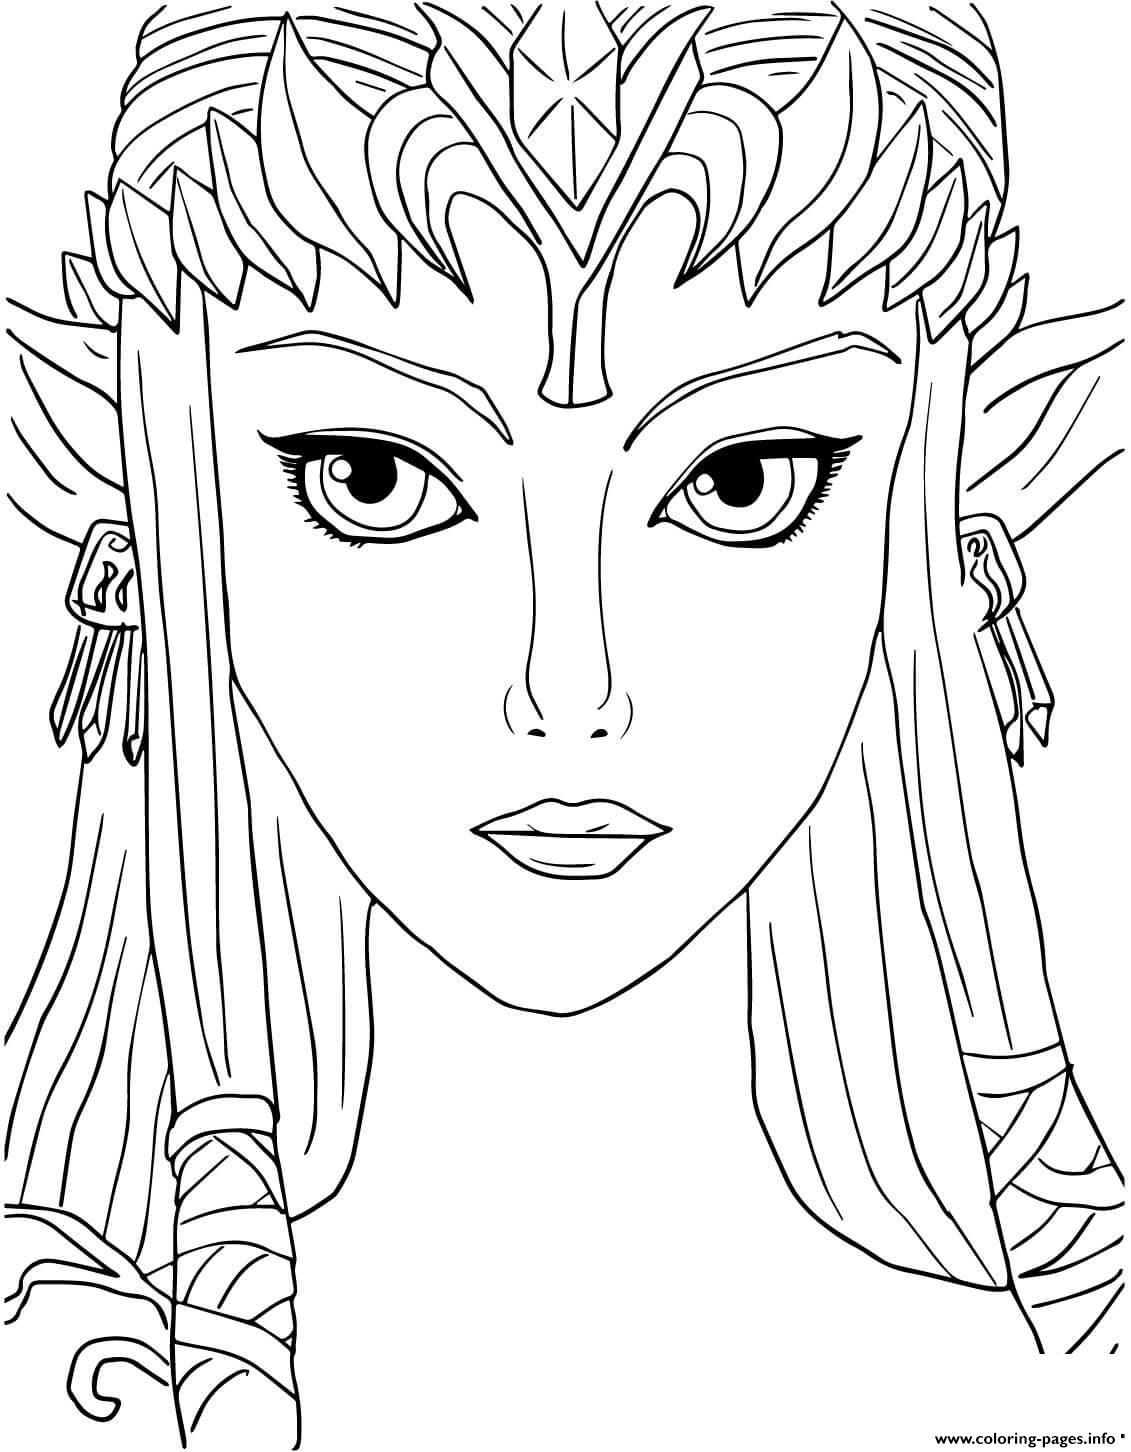 Legend Of Zelda Twilight Princess Coloring Pages Printable